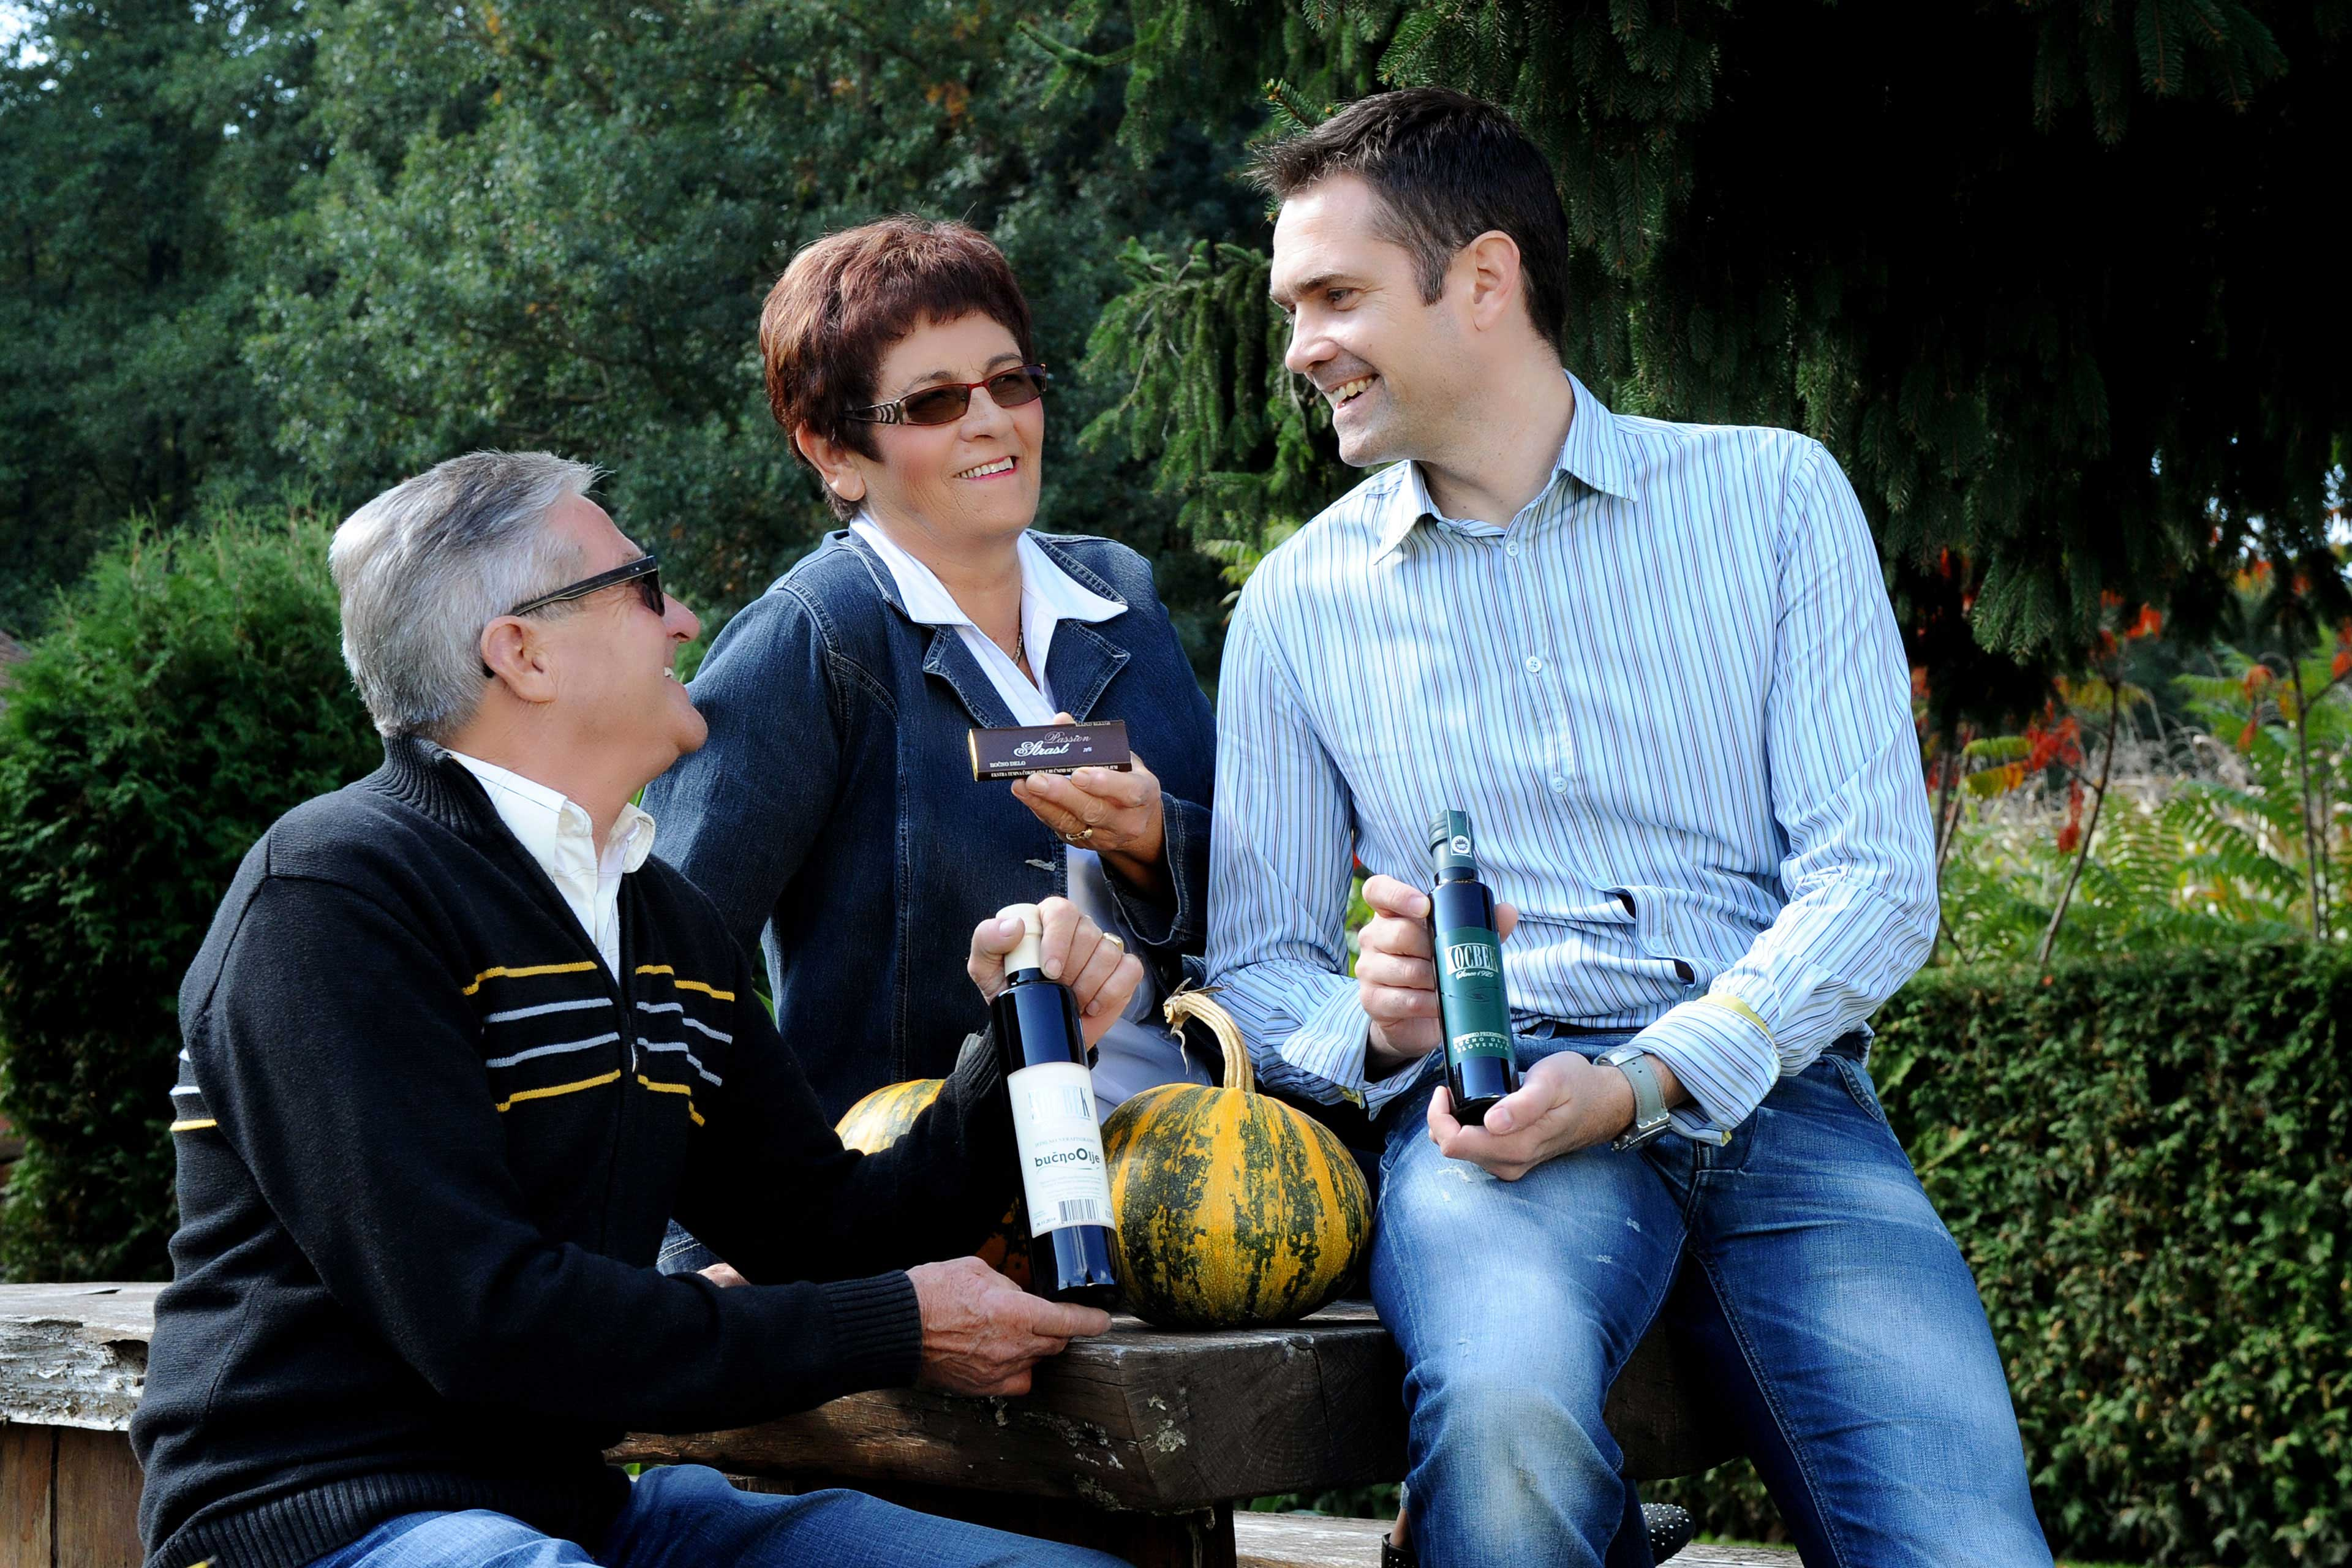 Viktorija Lazar, Supervisor, co-owner and wife of Agromehanika founder Friderik Lazar, Franc Selak, Supervisor and co-owner, Janez Pušavec, Supervisor and co-owner of Agromehanika d. d.